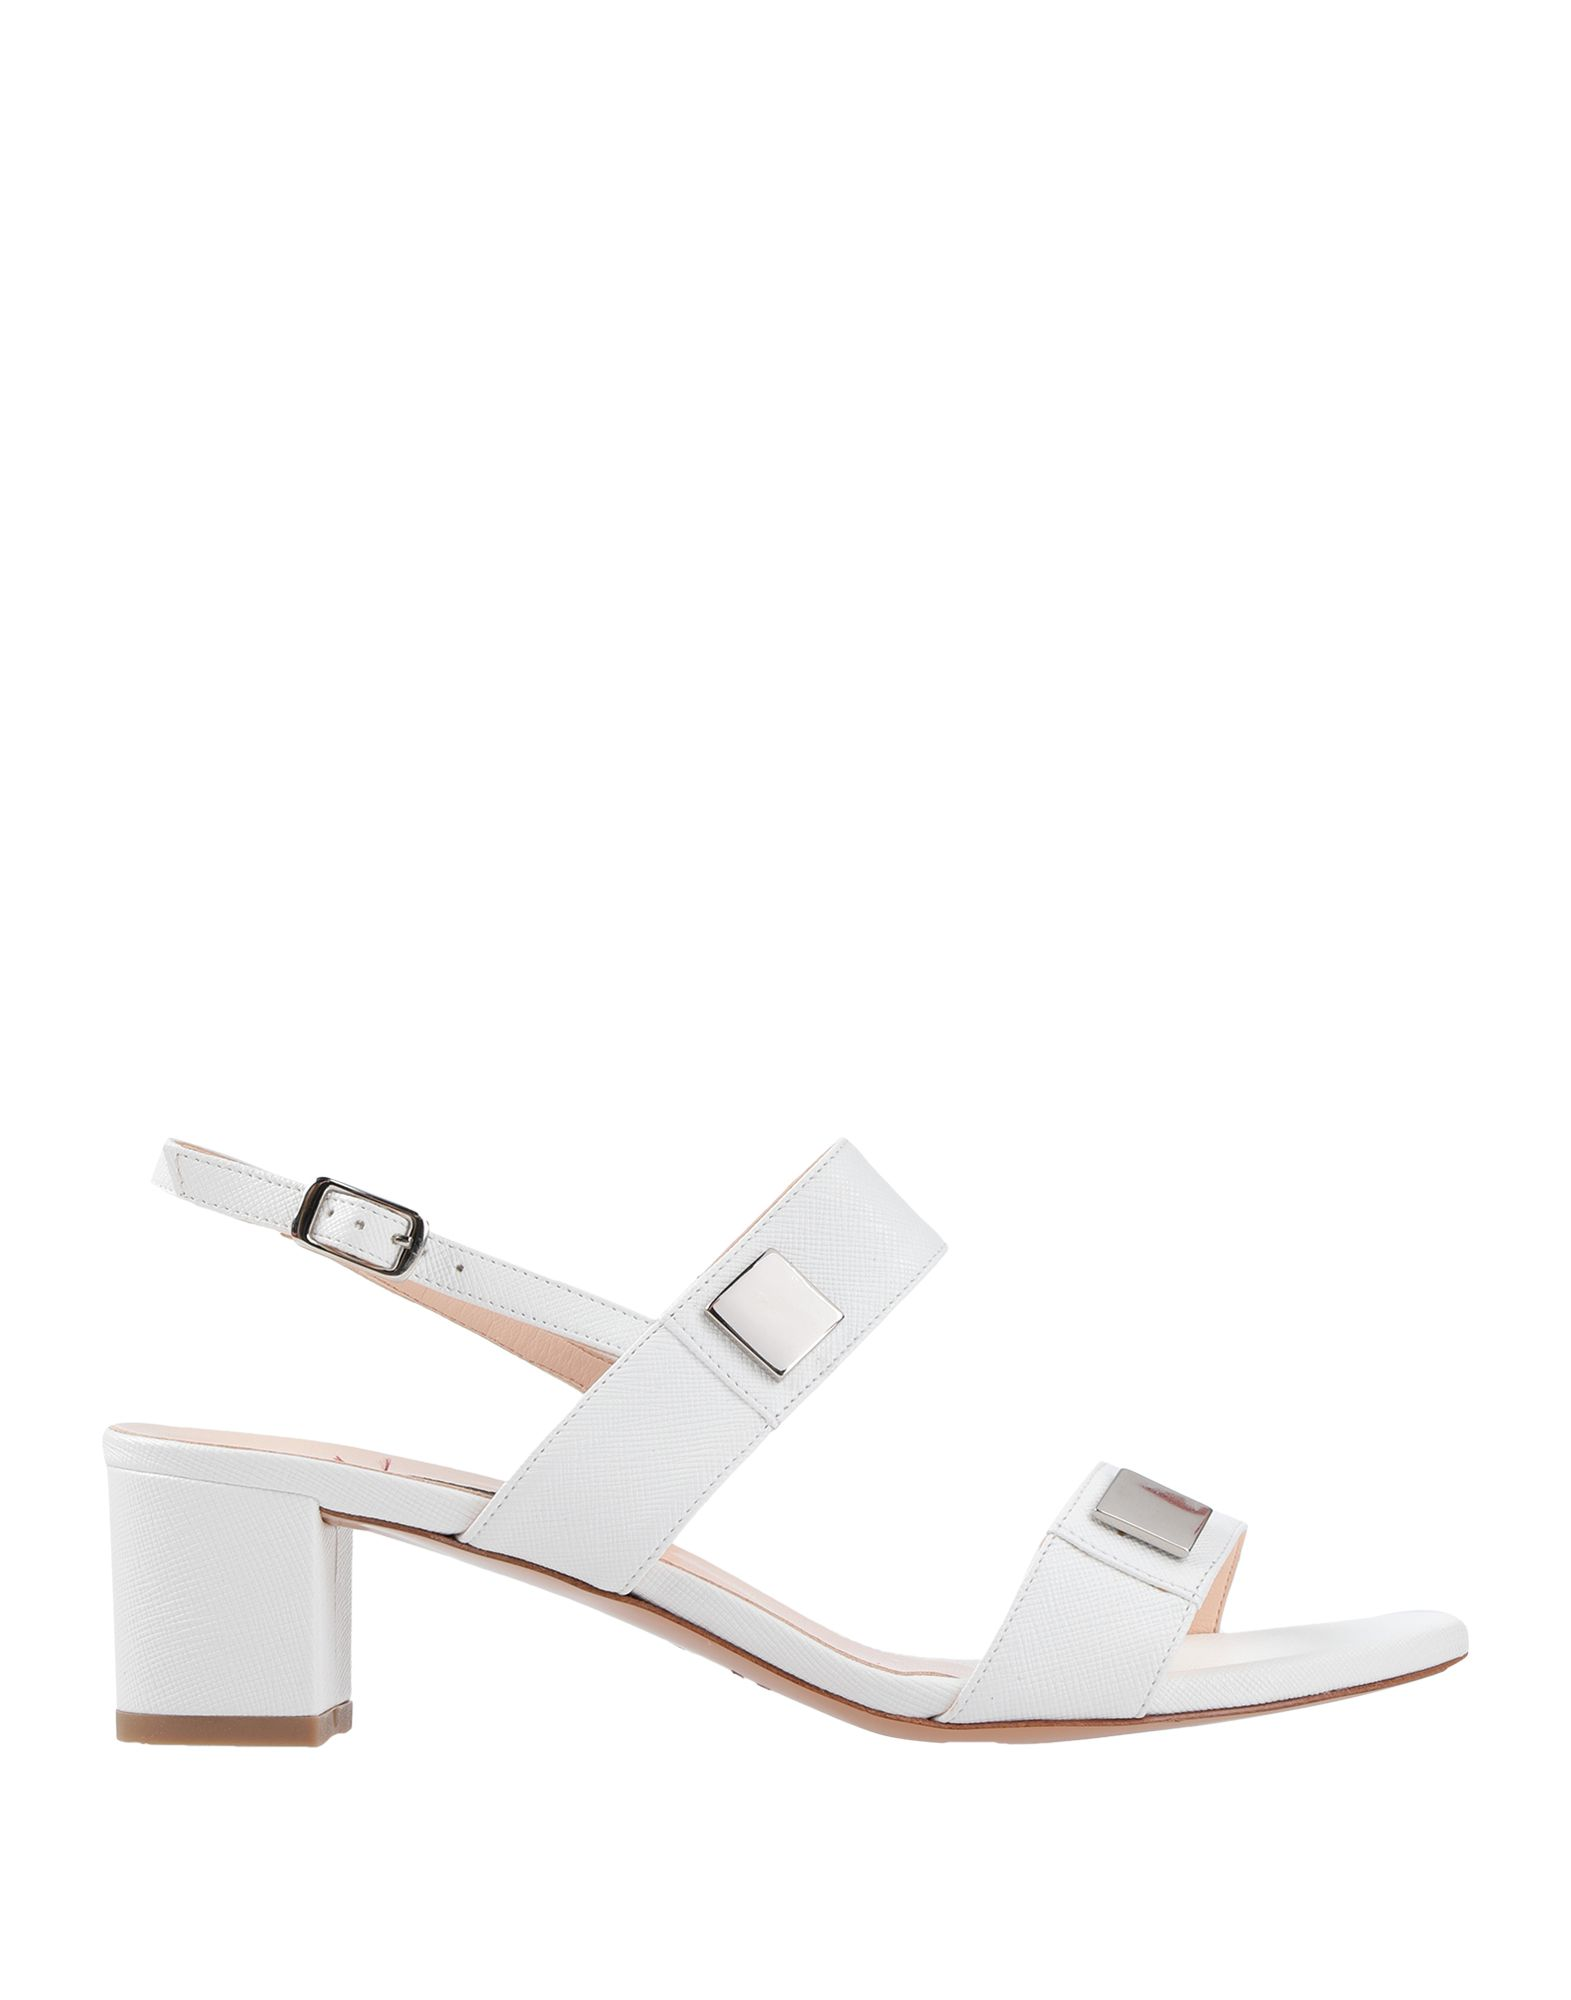 L amour Gute Sandalen Damen 11532234LC Gute amour Qualität beliebte Schuhe 3e0065